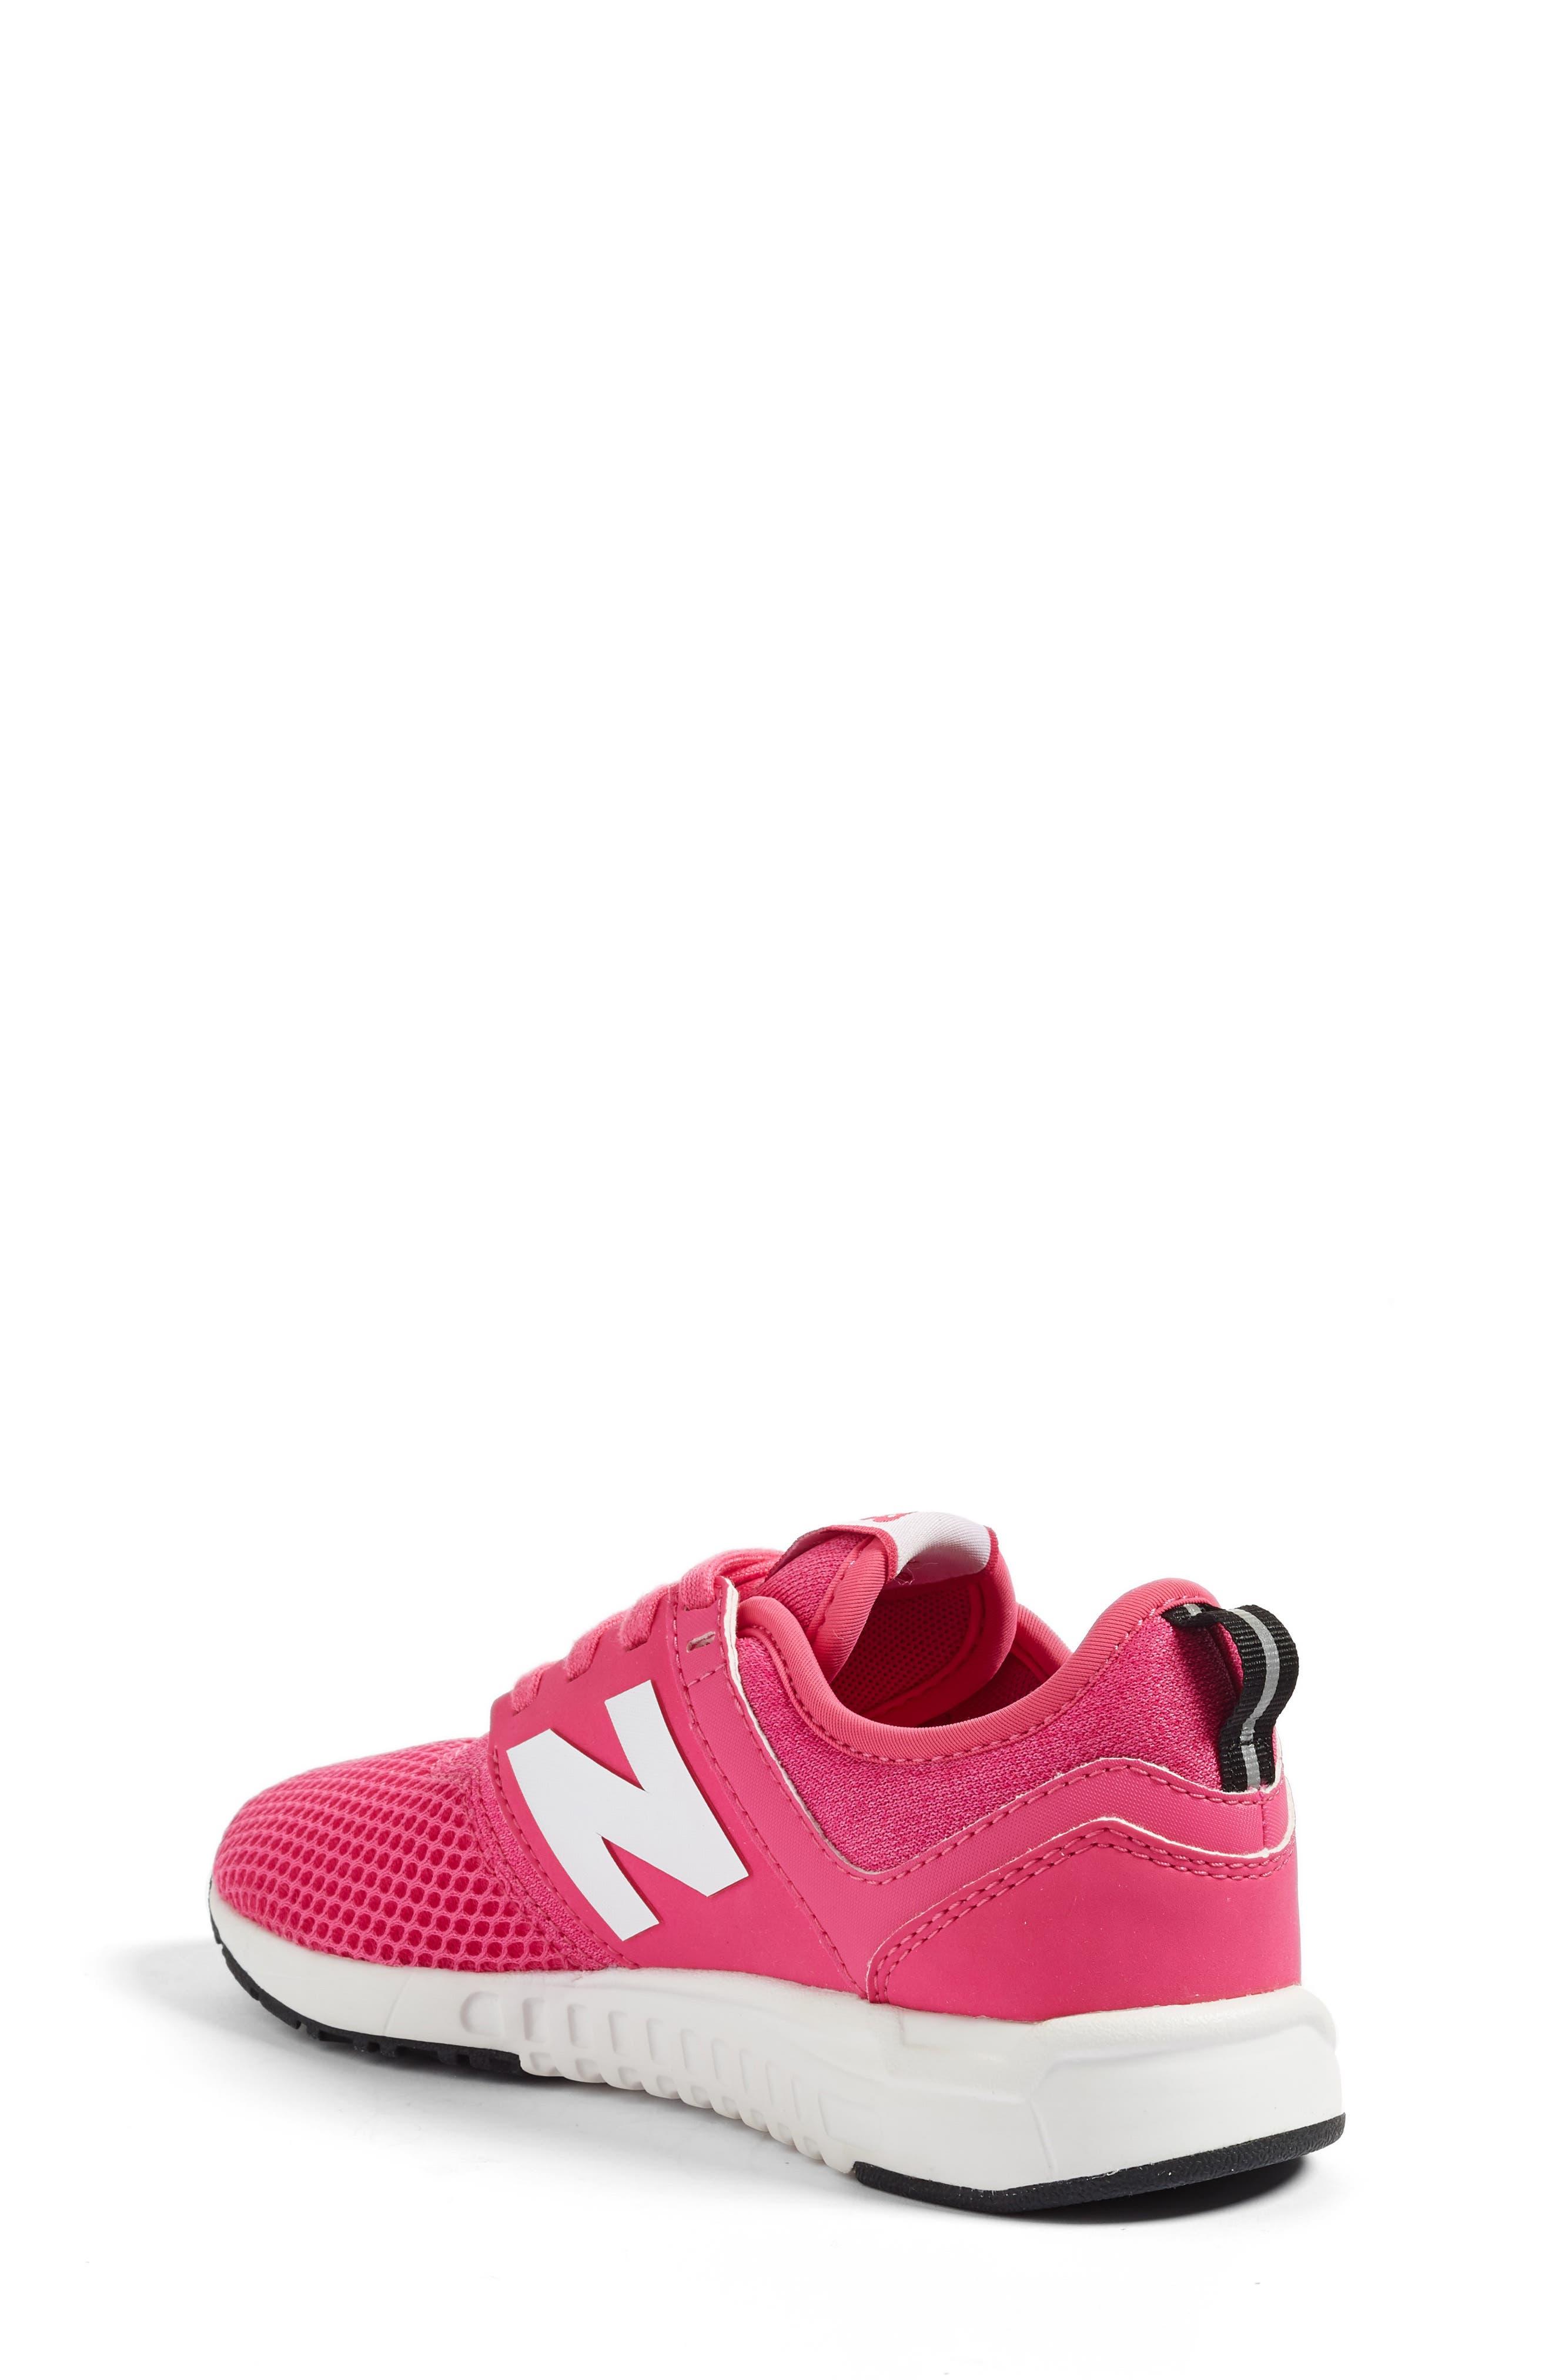 Alternate Image 3  - New Balance 247 Sport Sneaker (Baby, Walker, Toddler, Little Kid & Big Kid)